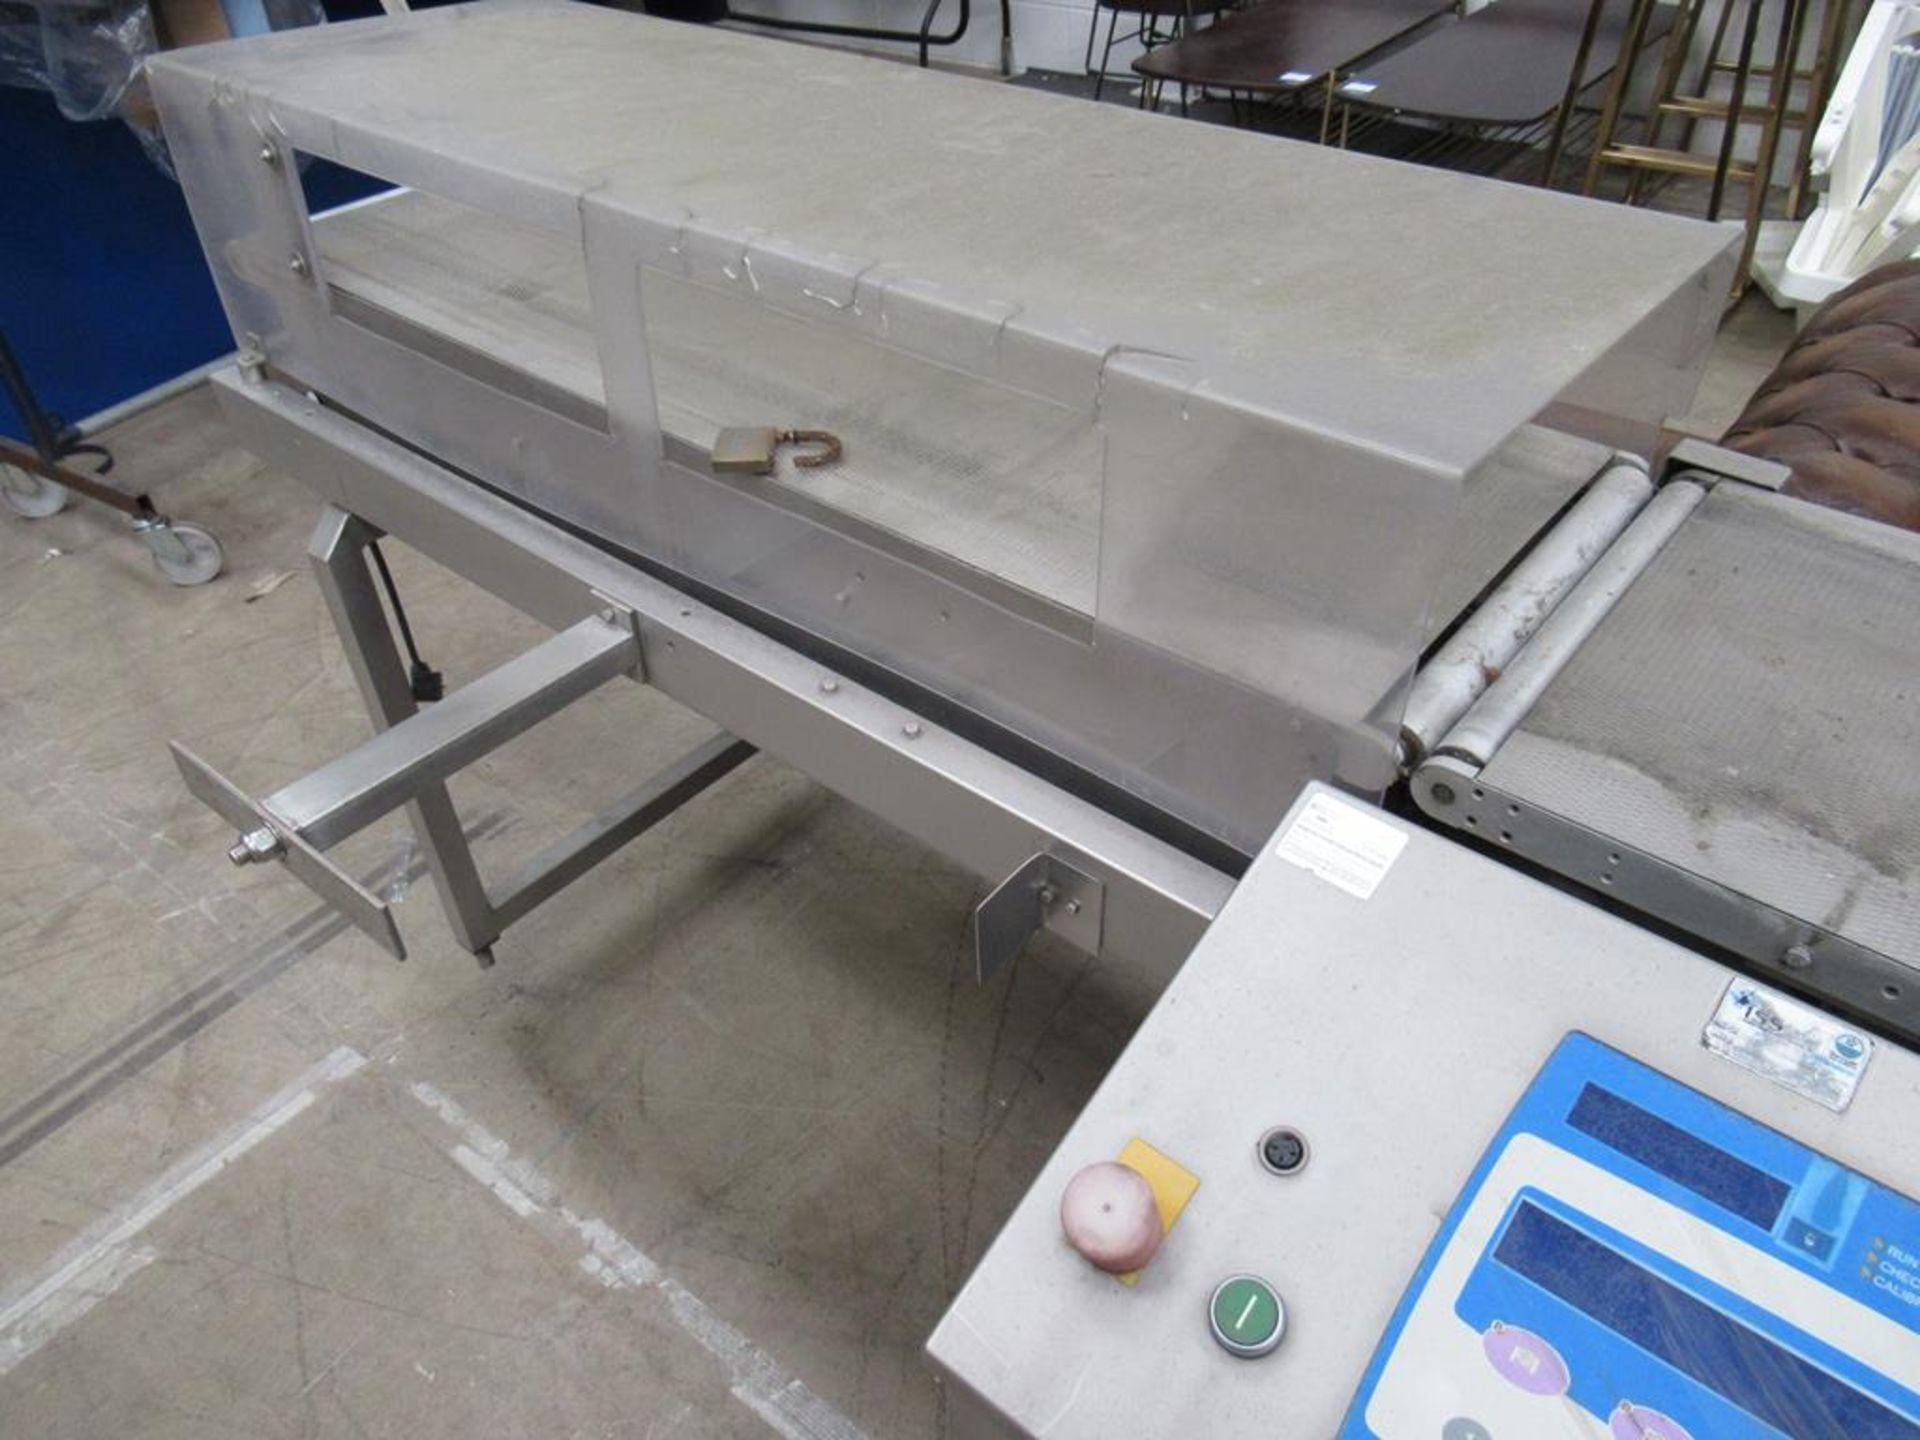 Loma 7000 Metal Detecting Conveyor - Image 4 of 7